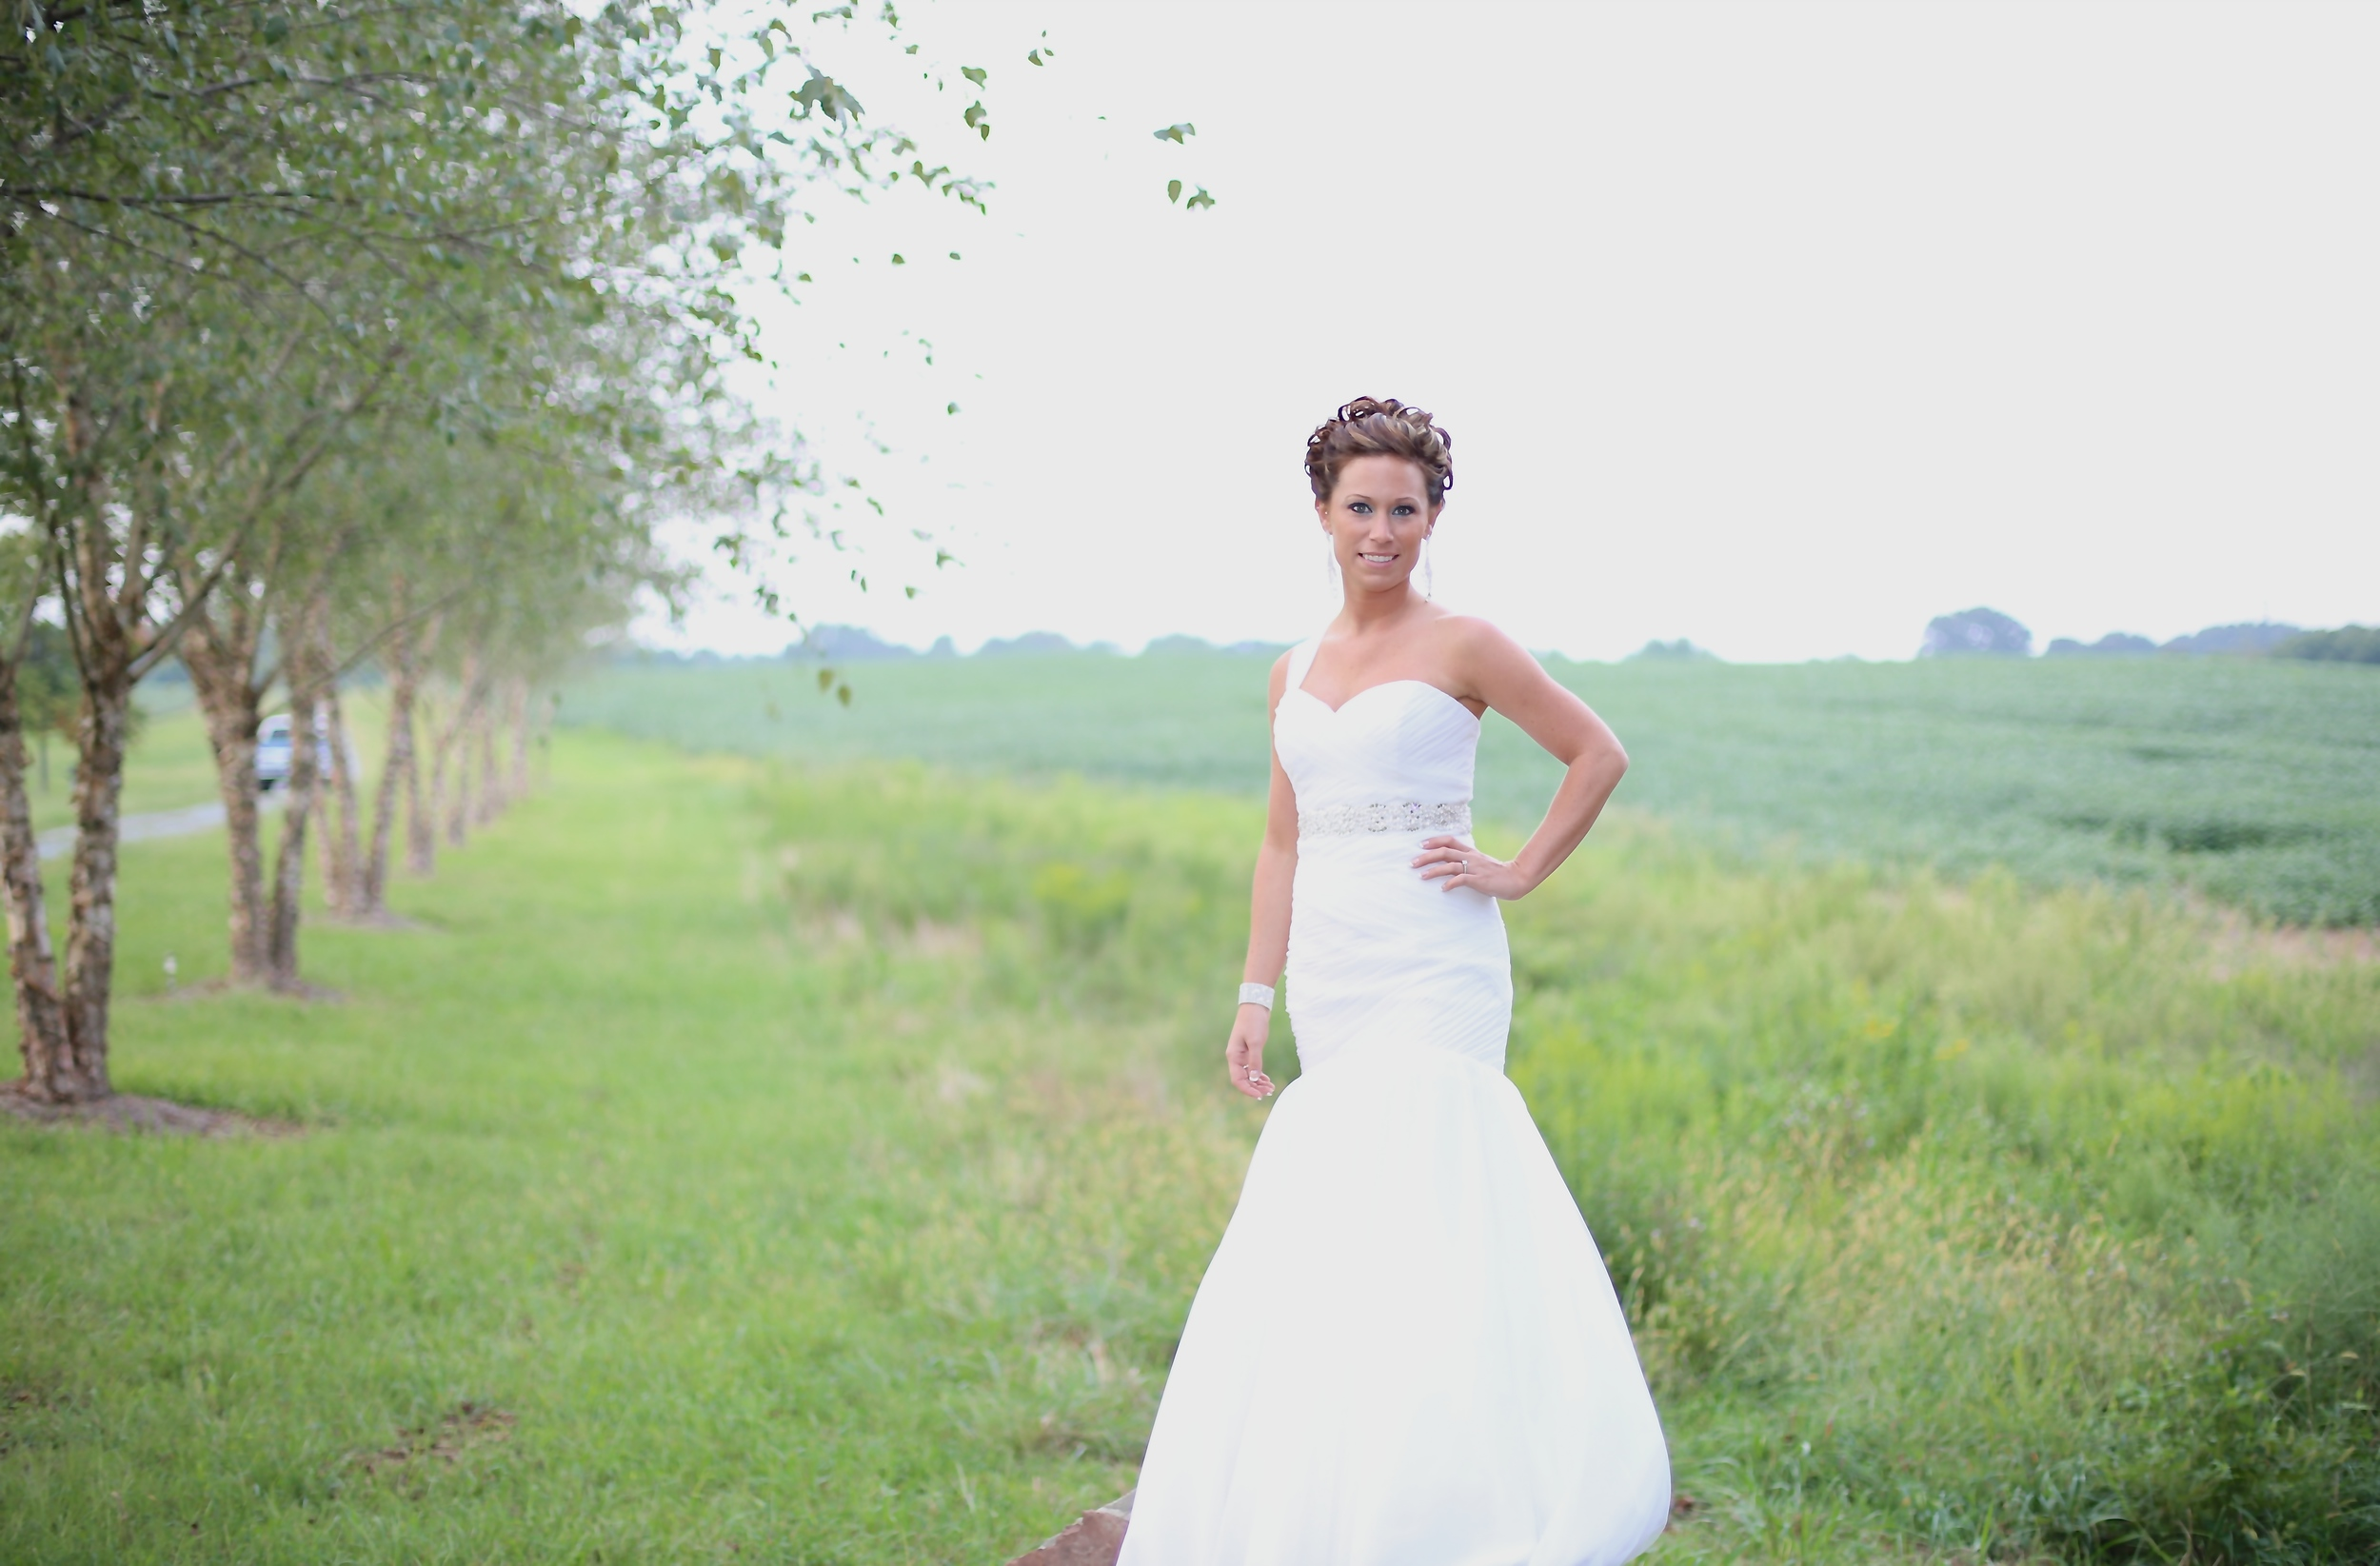 joanna bridal shoot 28